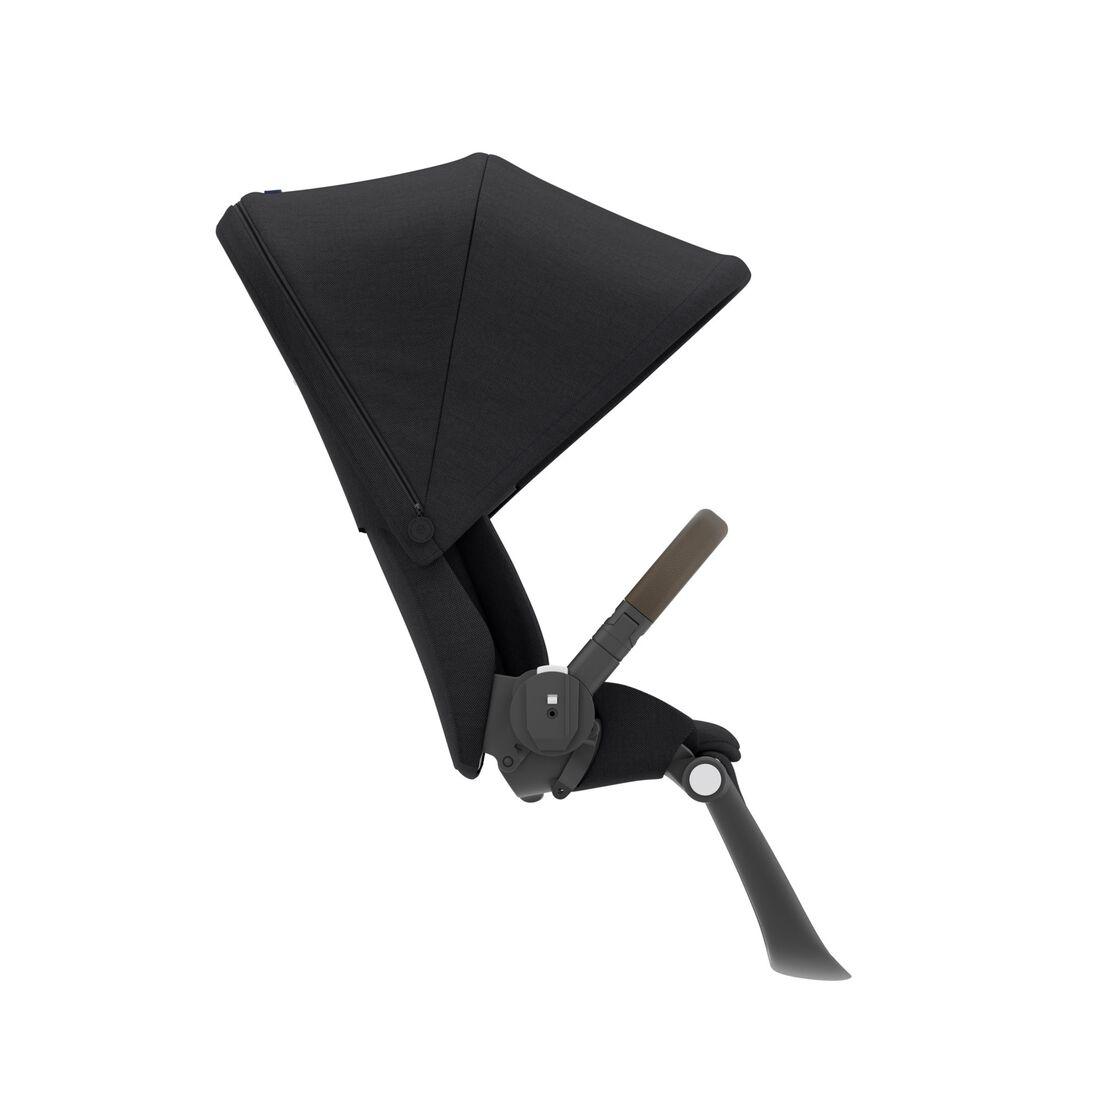 CYBEX Gazelle S Sitzeinheit - Deep Black (Taupe Frame) in Deep Black (Taupe Frame) large Bild 2